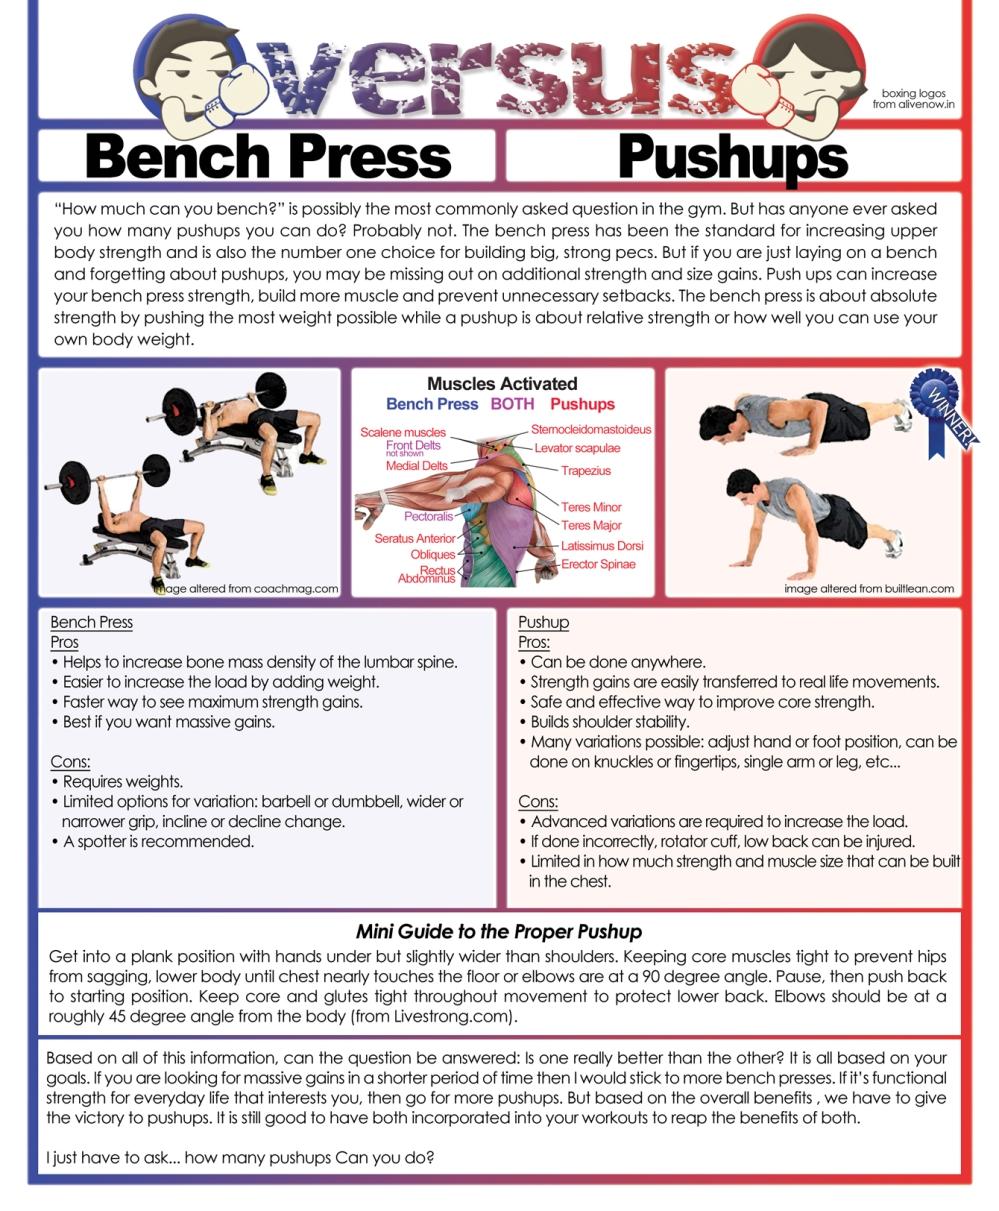 Versus_Pushups Bench Press.jpg